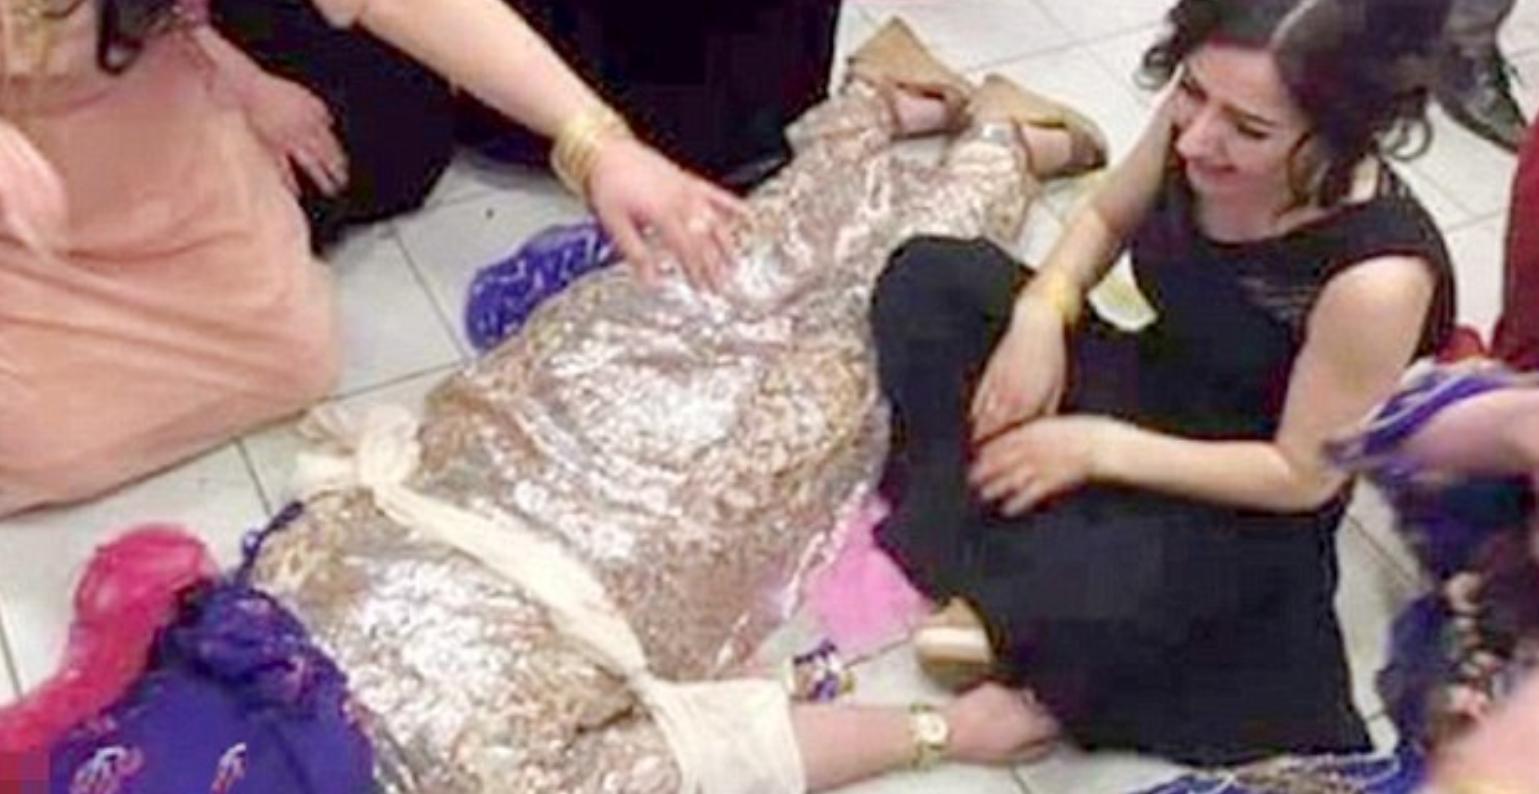 O tanara kurda a fost impuscata mortal la o nunta in Germania chiar de varul ei. Ce a refuzat femeia sa faca